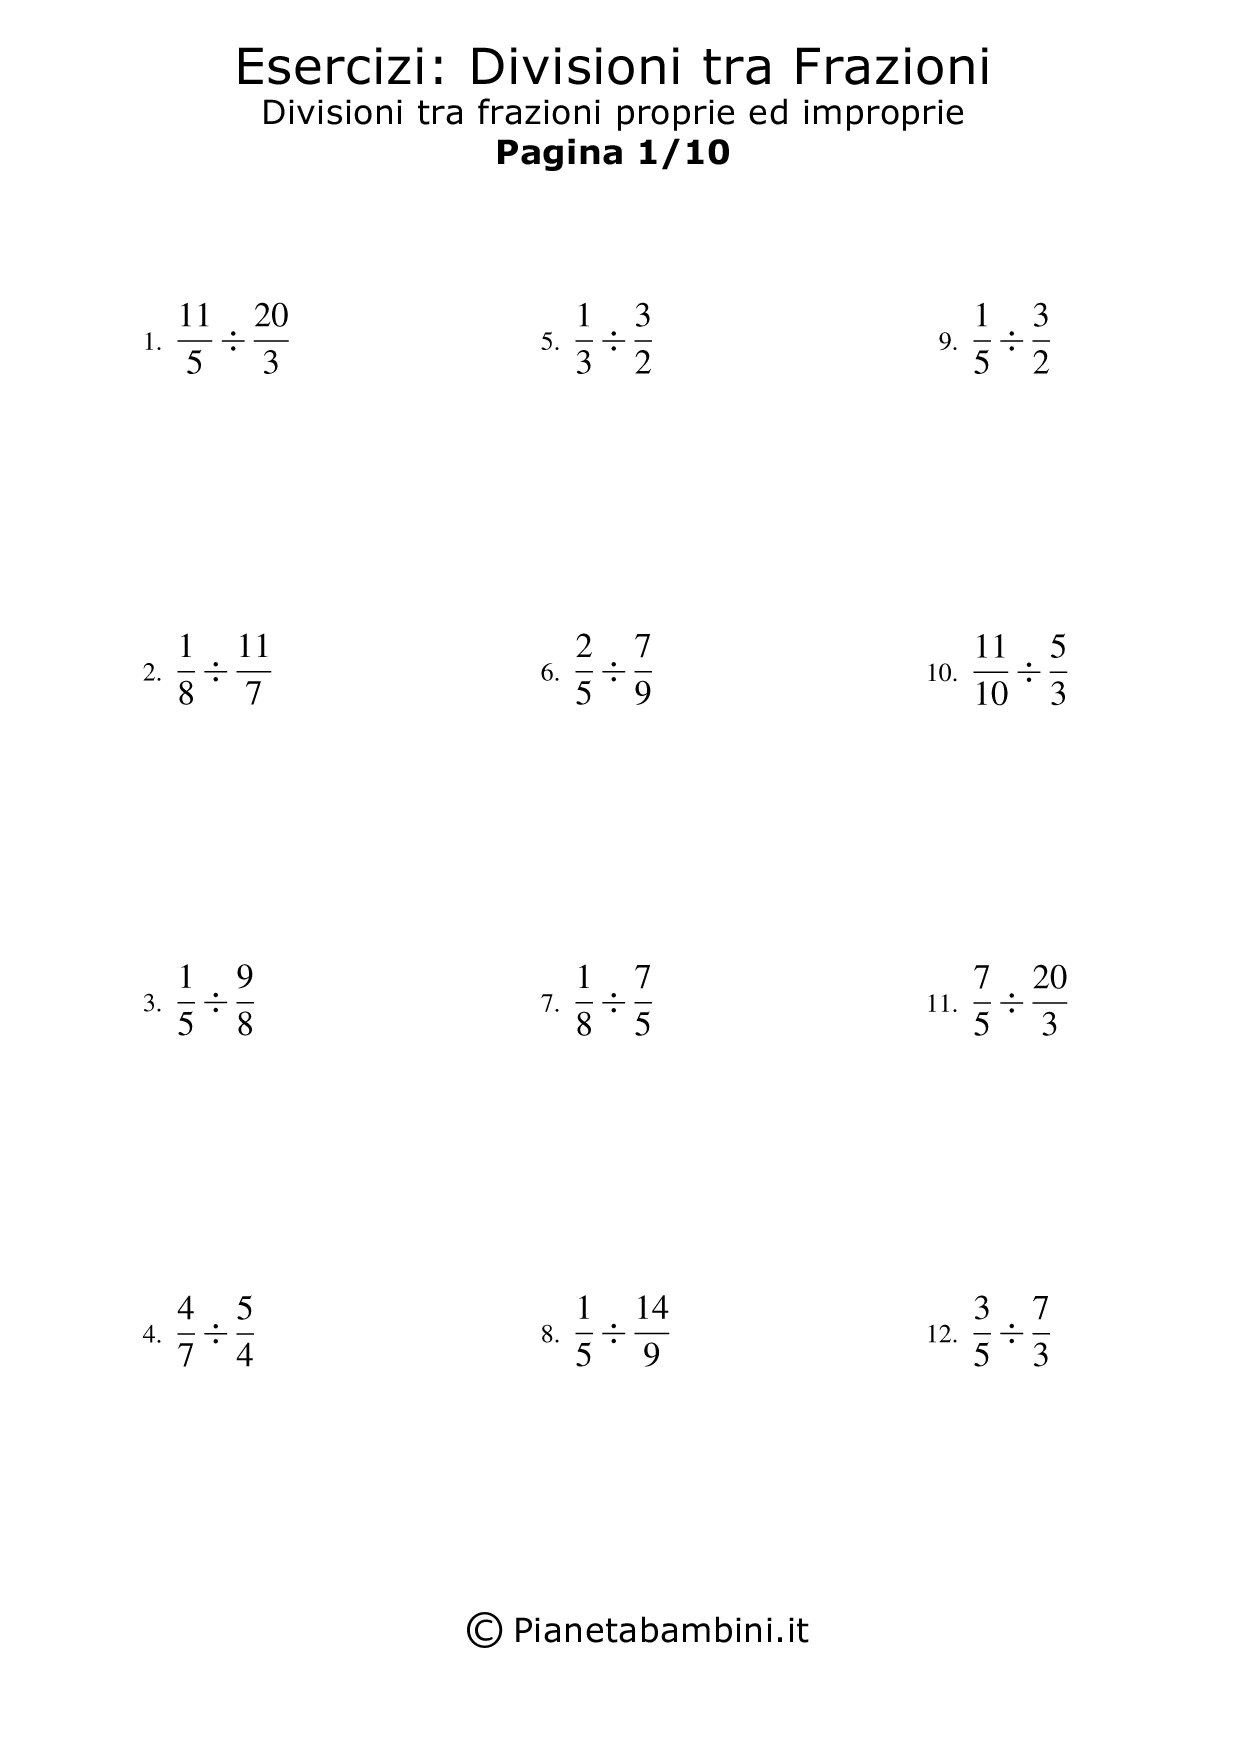 Esercizi-Divisioni-Frazioni-Proprie-Improprie_01